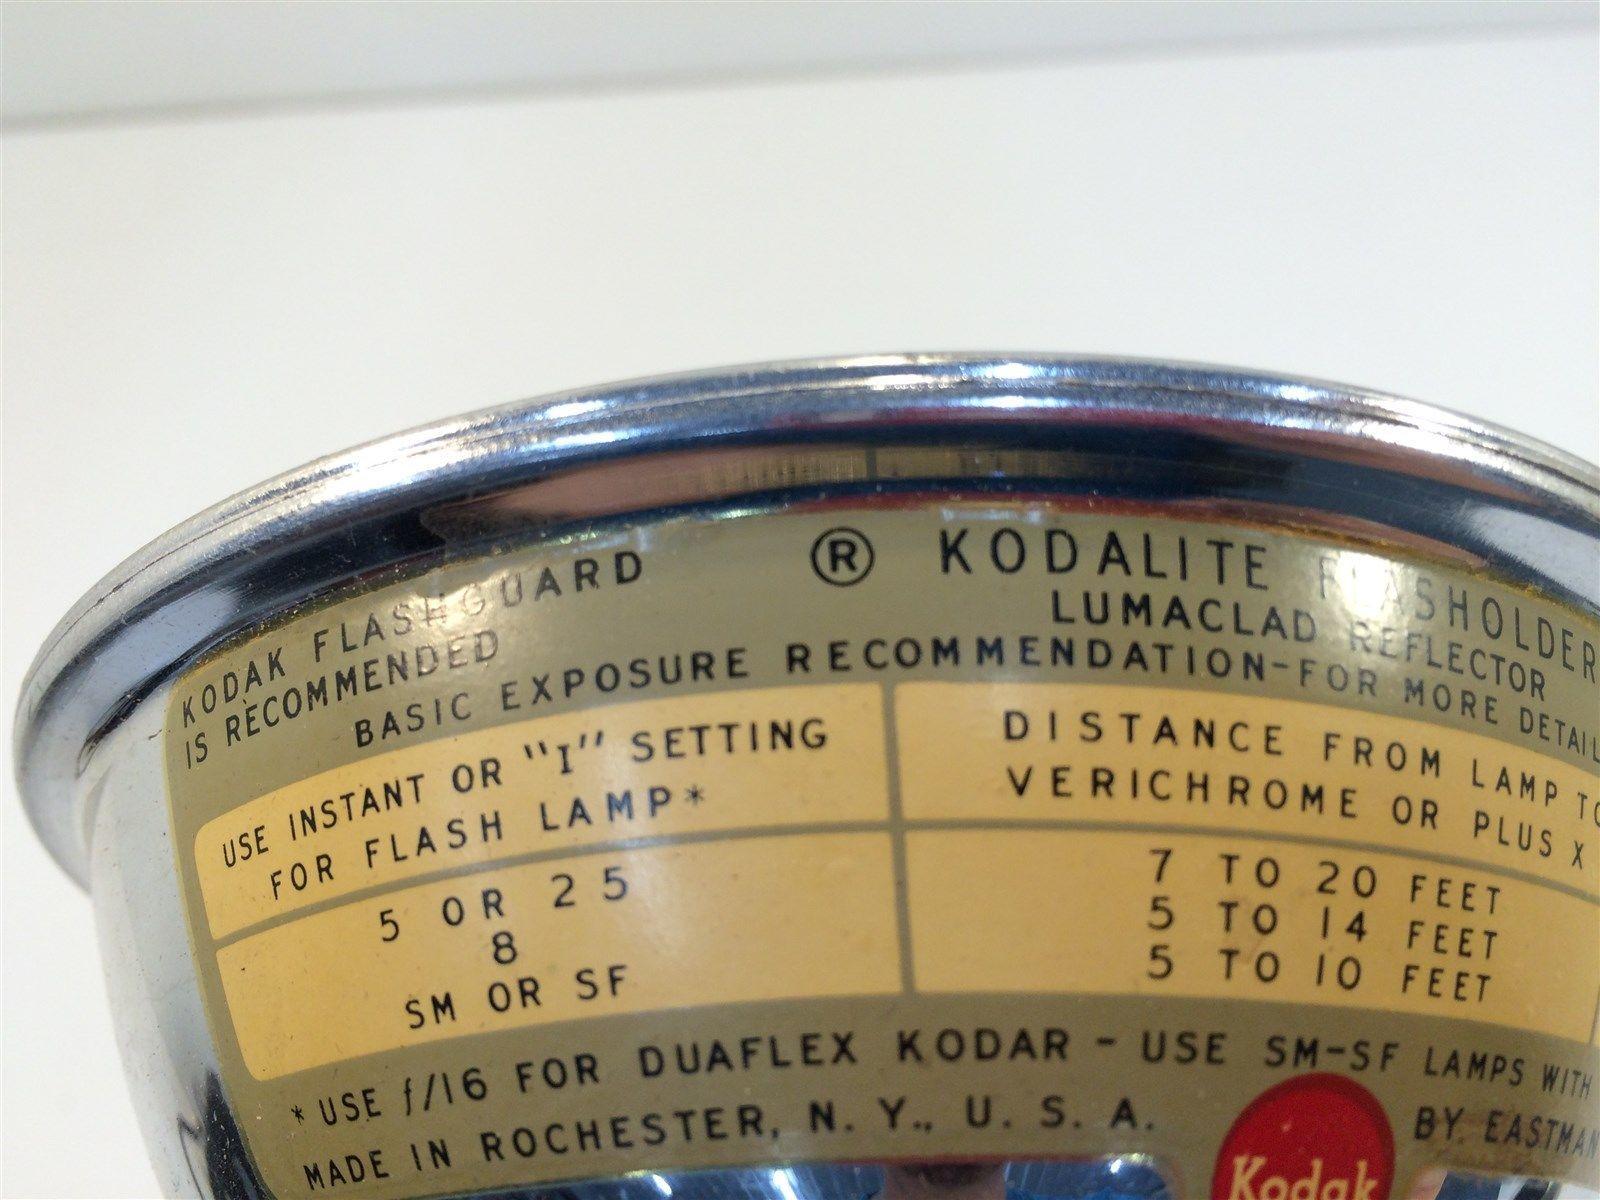 Vintage Kodak Kodalite Flasholder Lumaclad Reflector